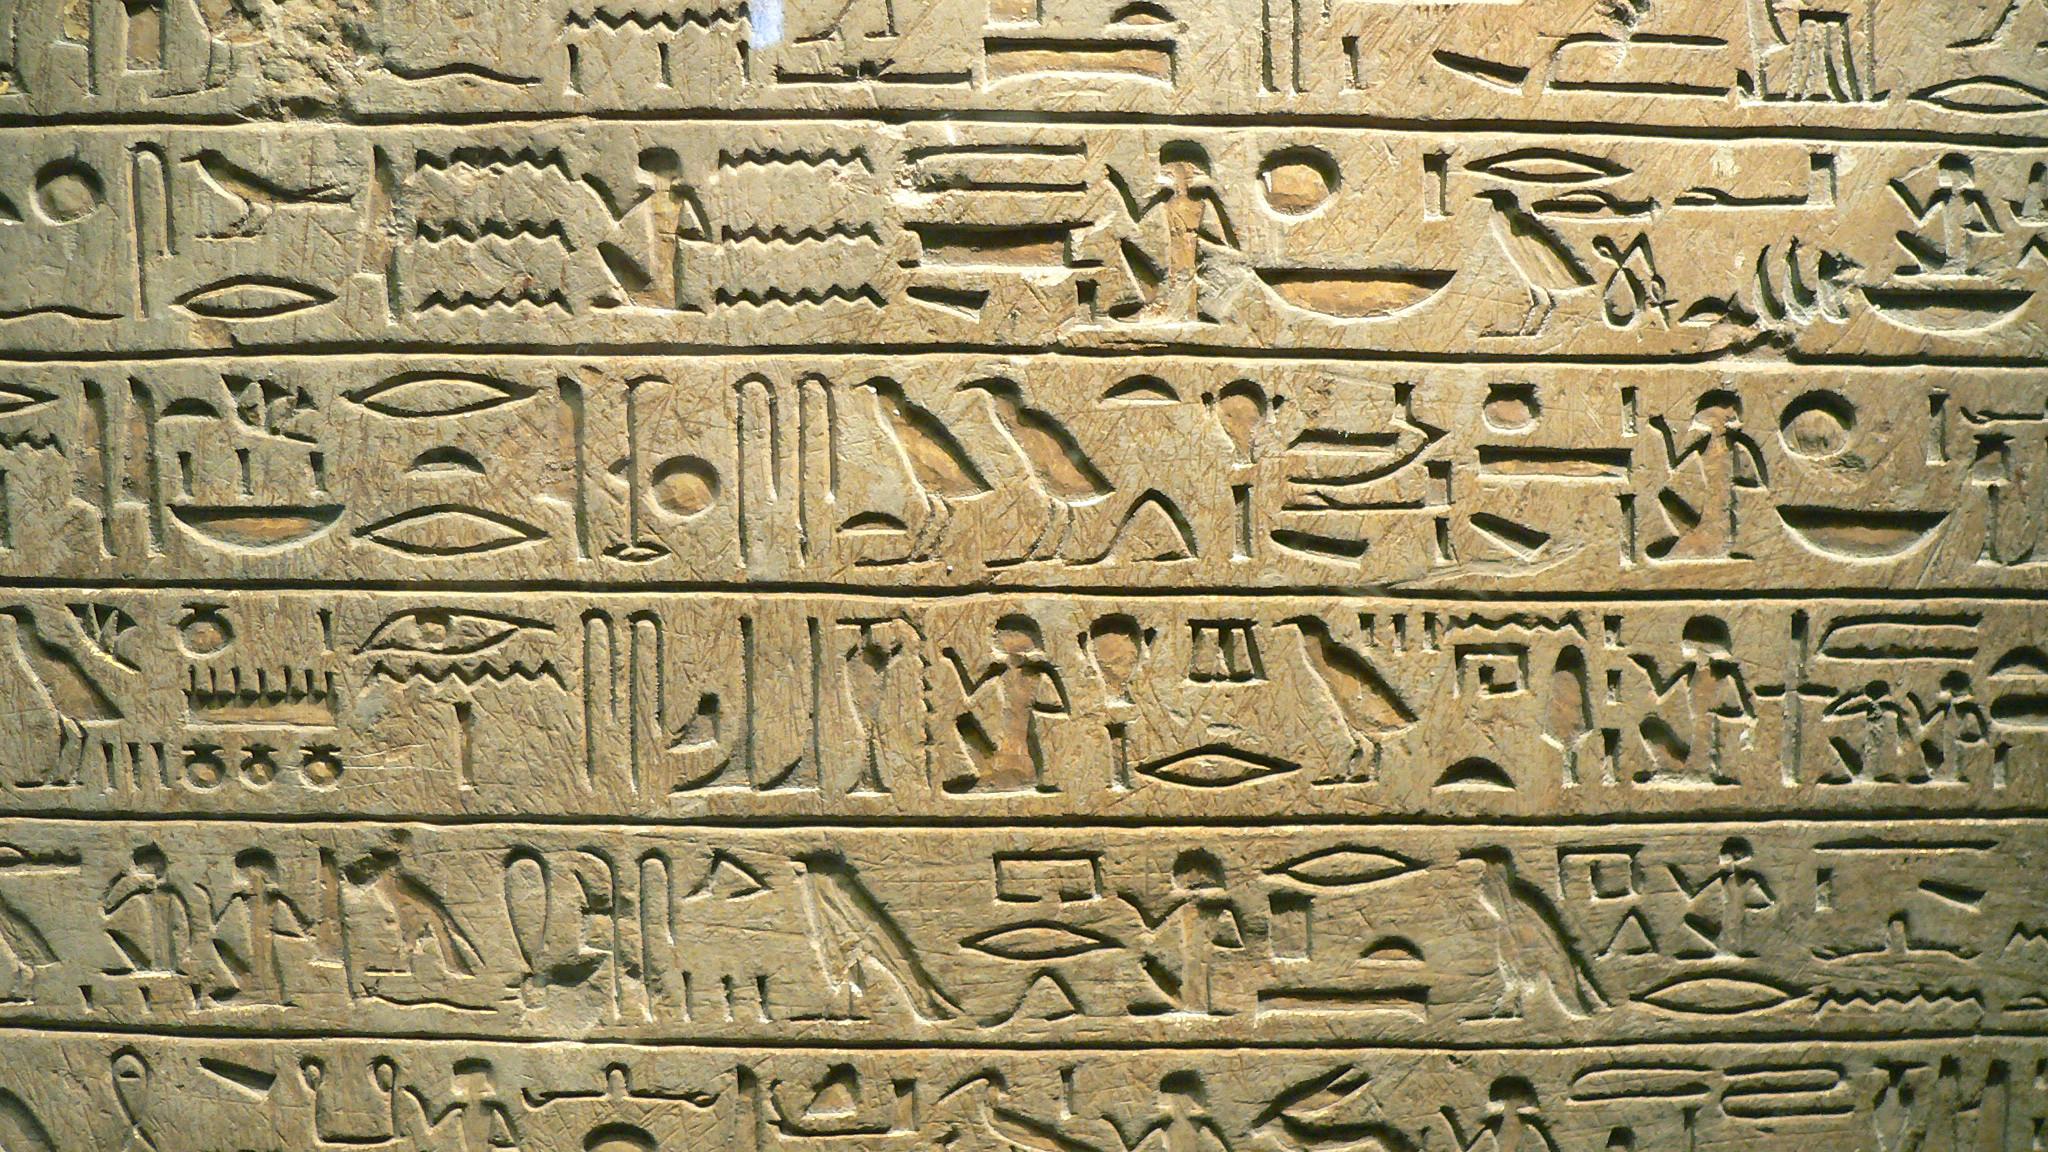 Few Egyptians Could Read Hieroglyphics